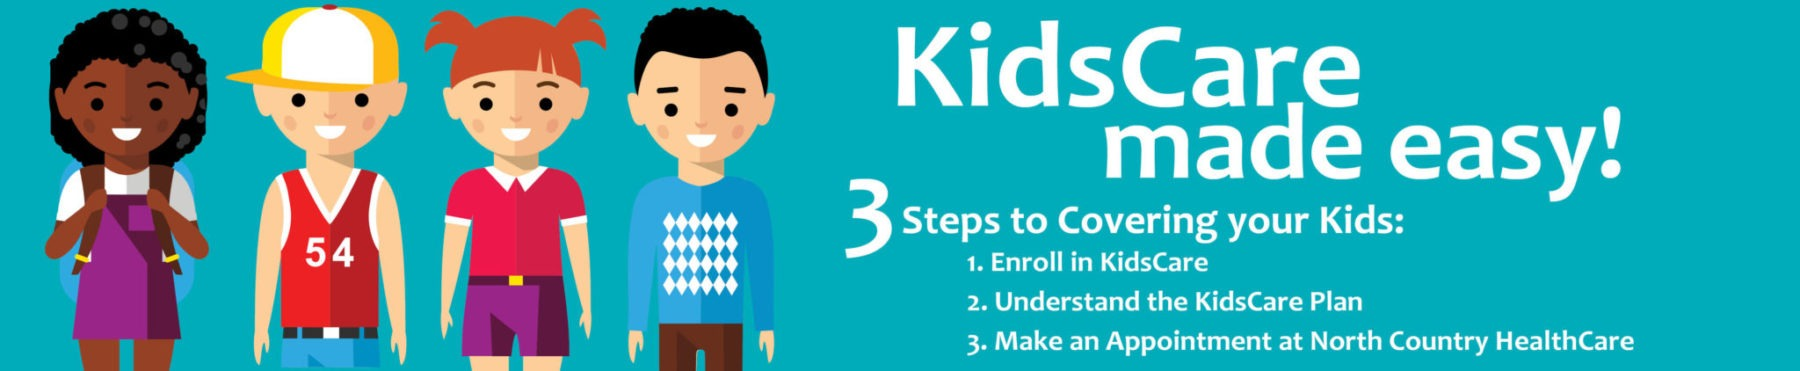 KidsCare Health Insurance & Enrollment Help in AZ | North ...